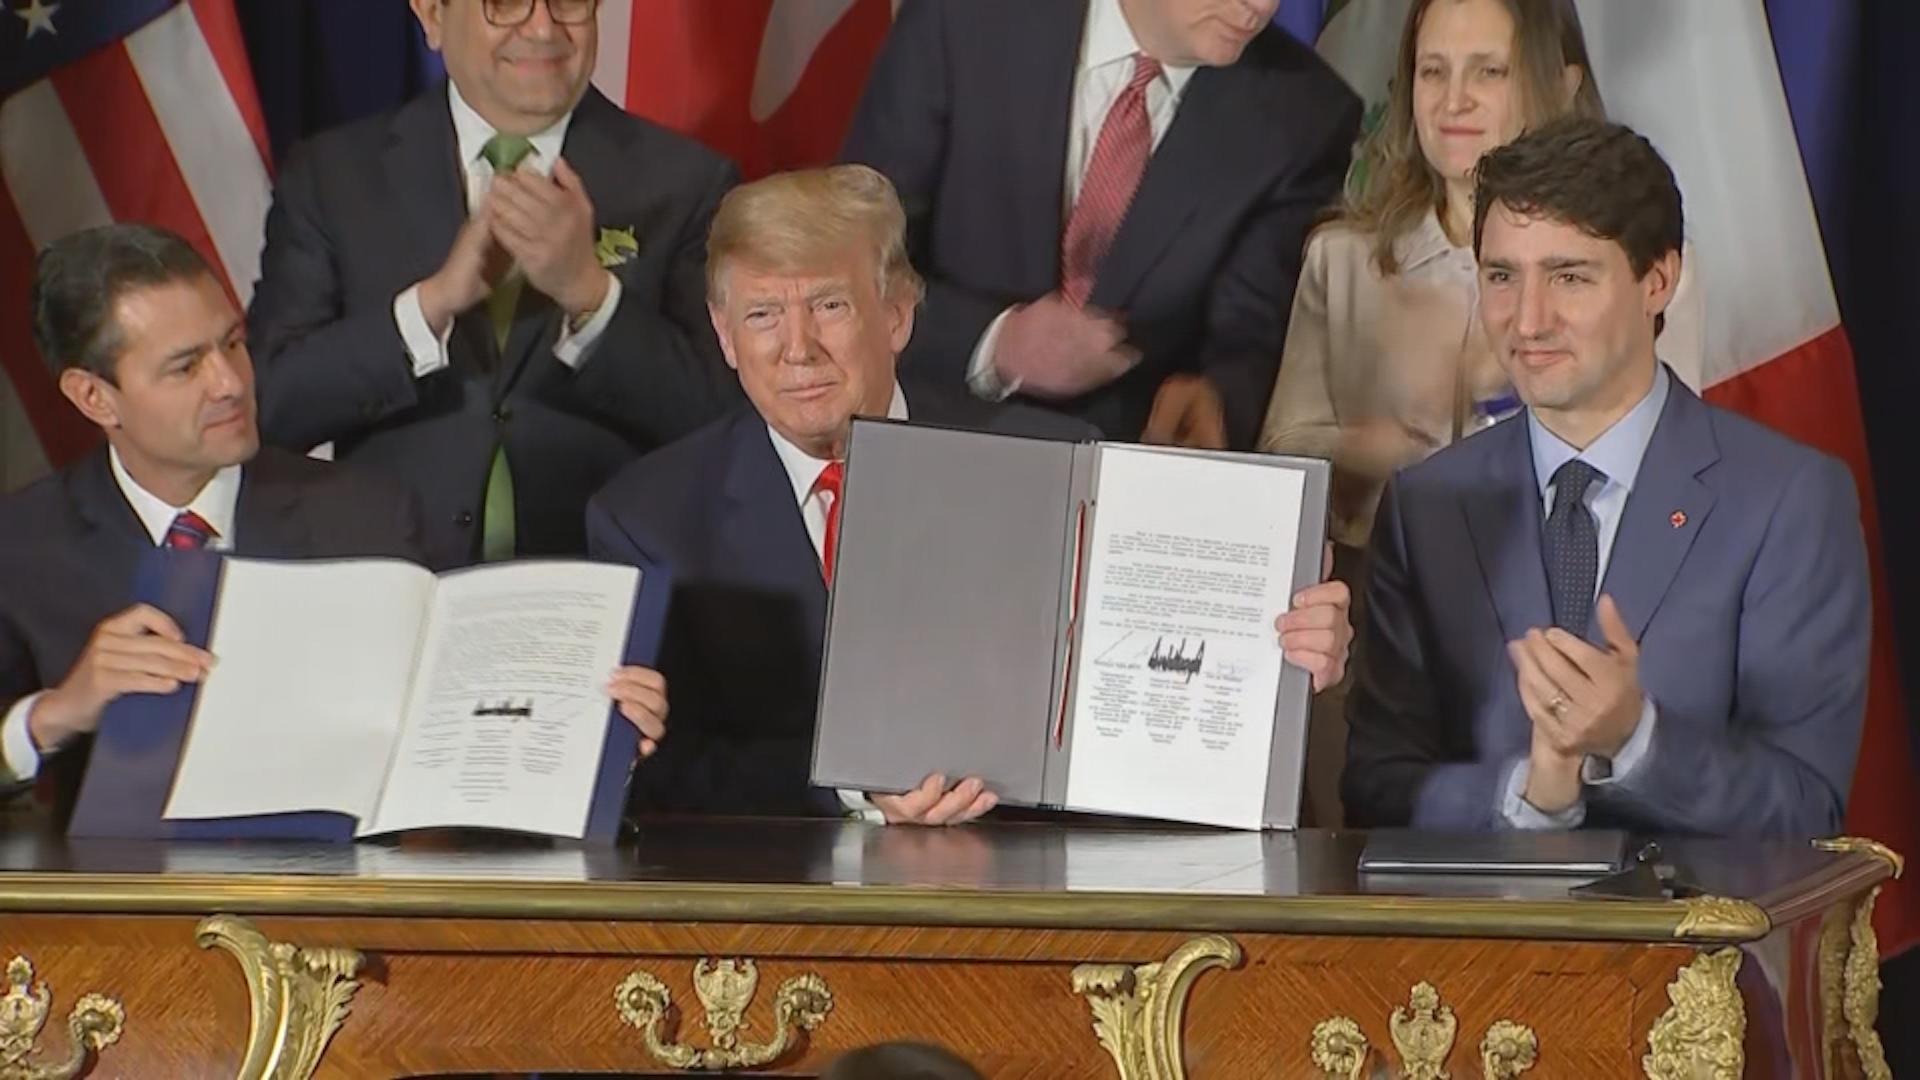 After signing new North American trade pact at G-20, Trump turns sights to China